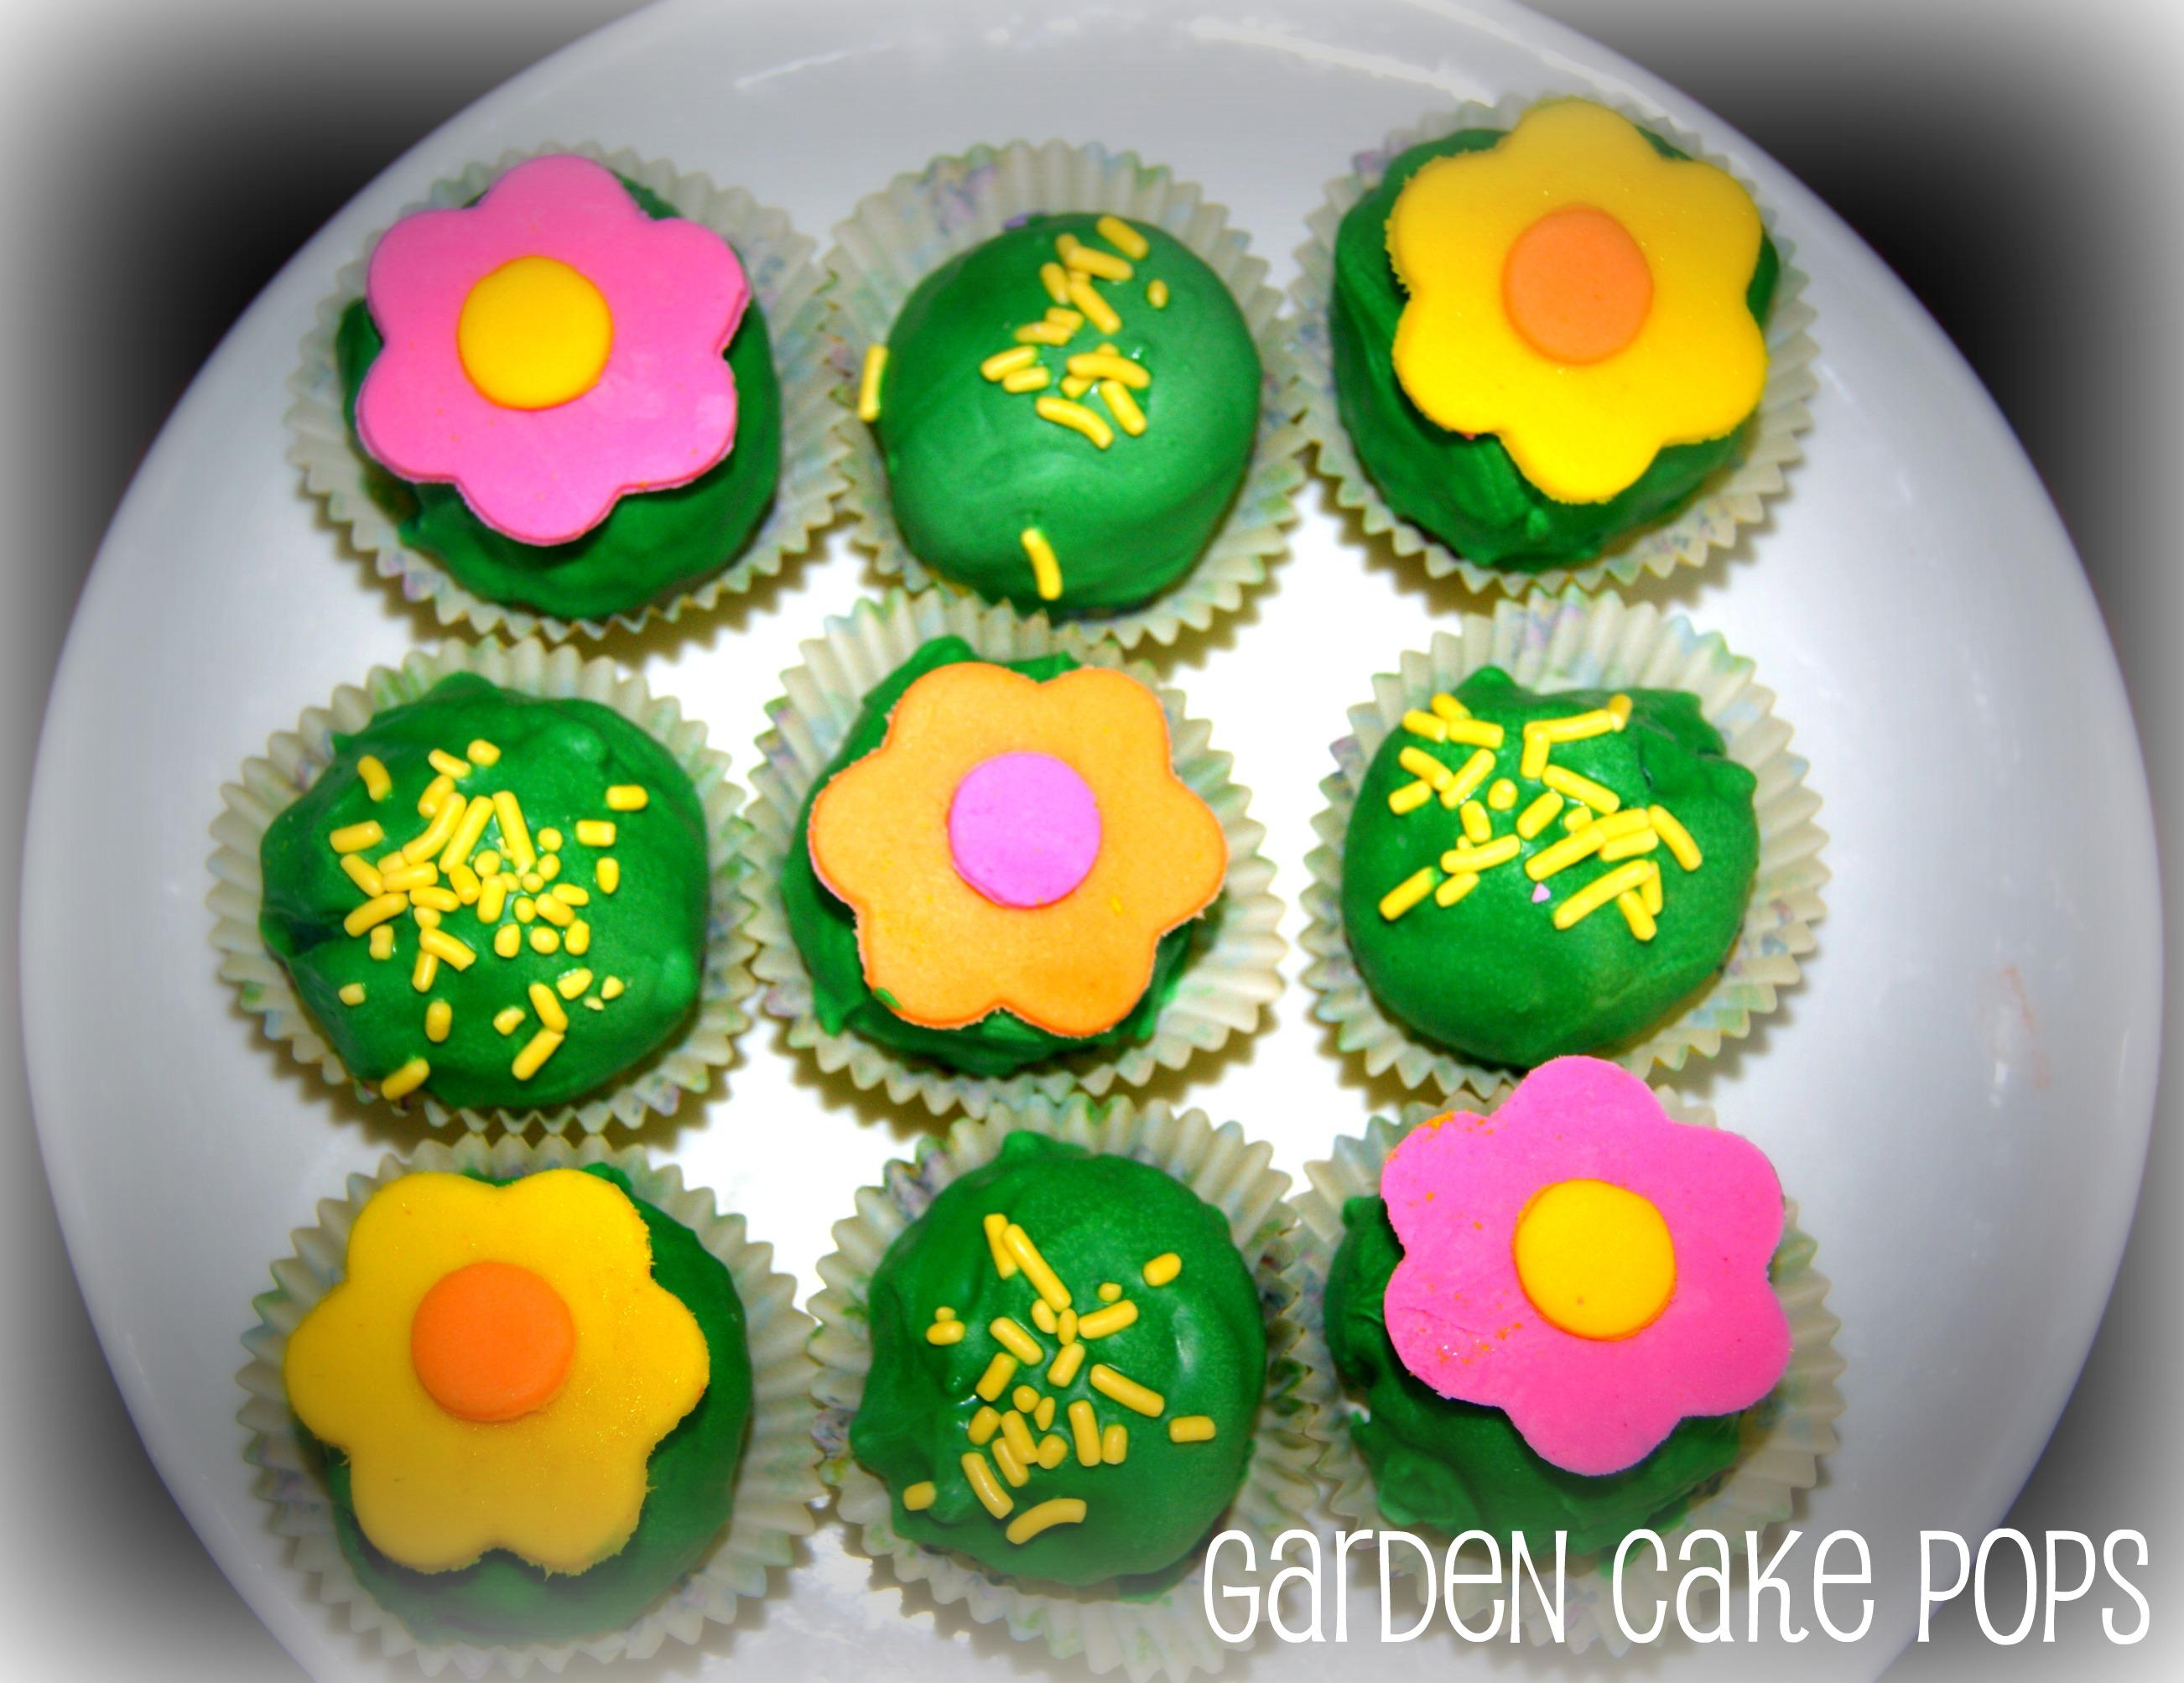 lulusbakeshop Garden Cake Popsjpg